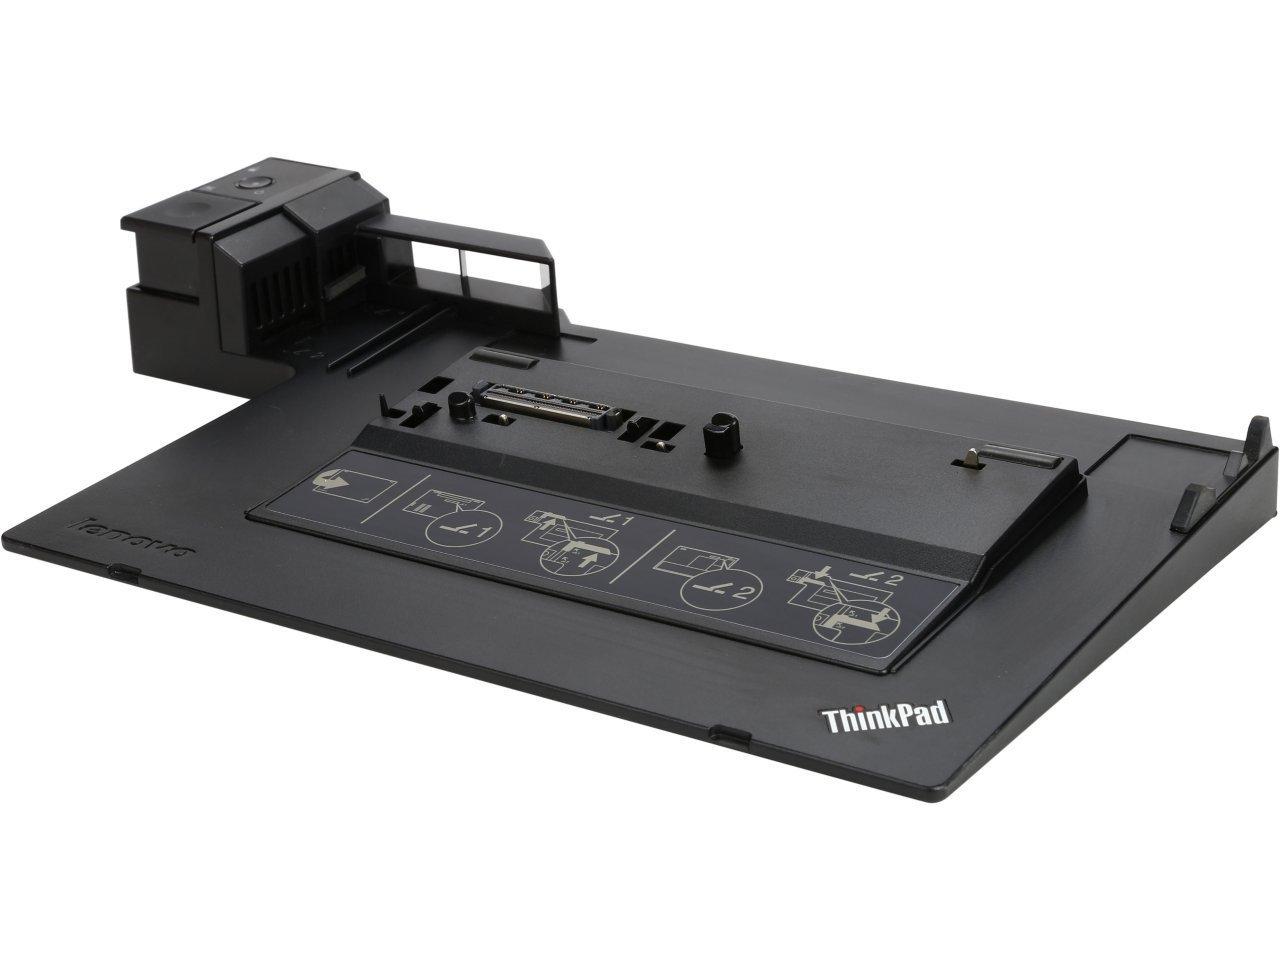 Lenovo Thinkpad Mini Dock Series 3 (433710U) by Lenovo